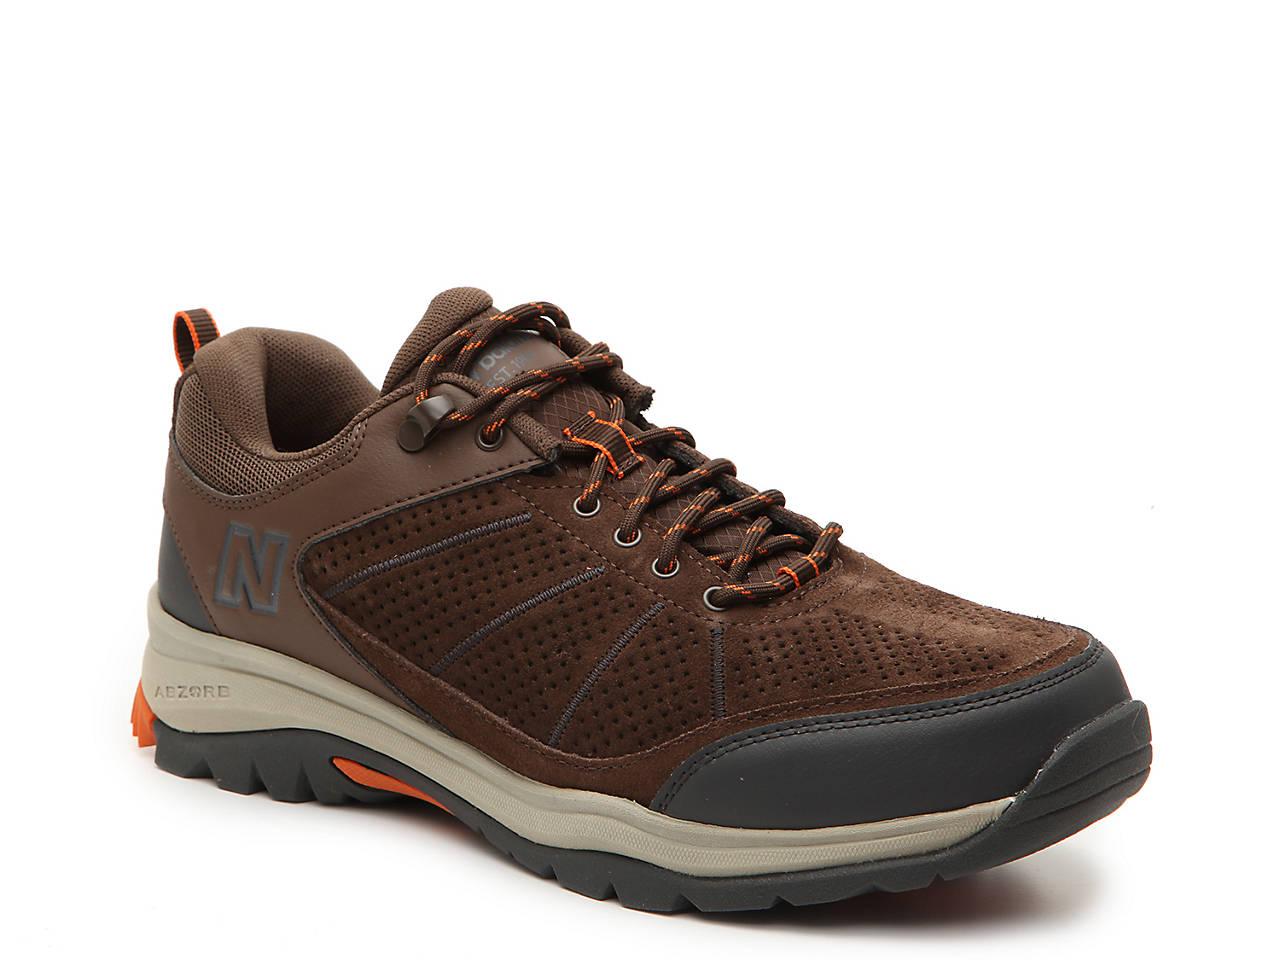 2e187151fc0f New Balance 1201 Trail Walking Shoe - Men s Men s Shoes